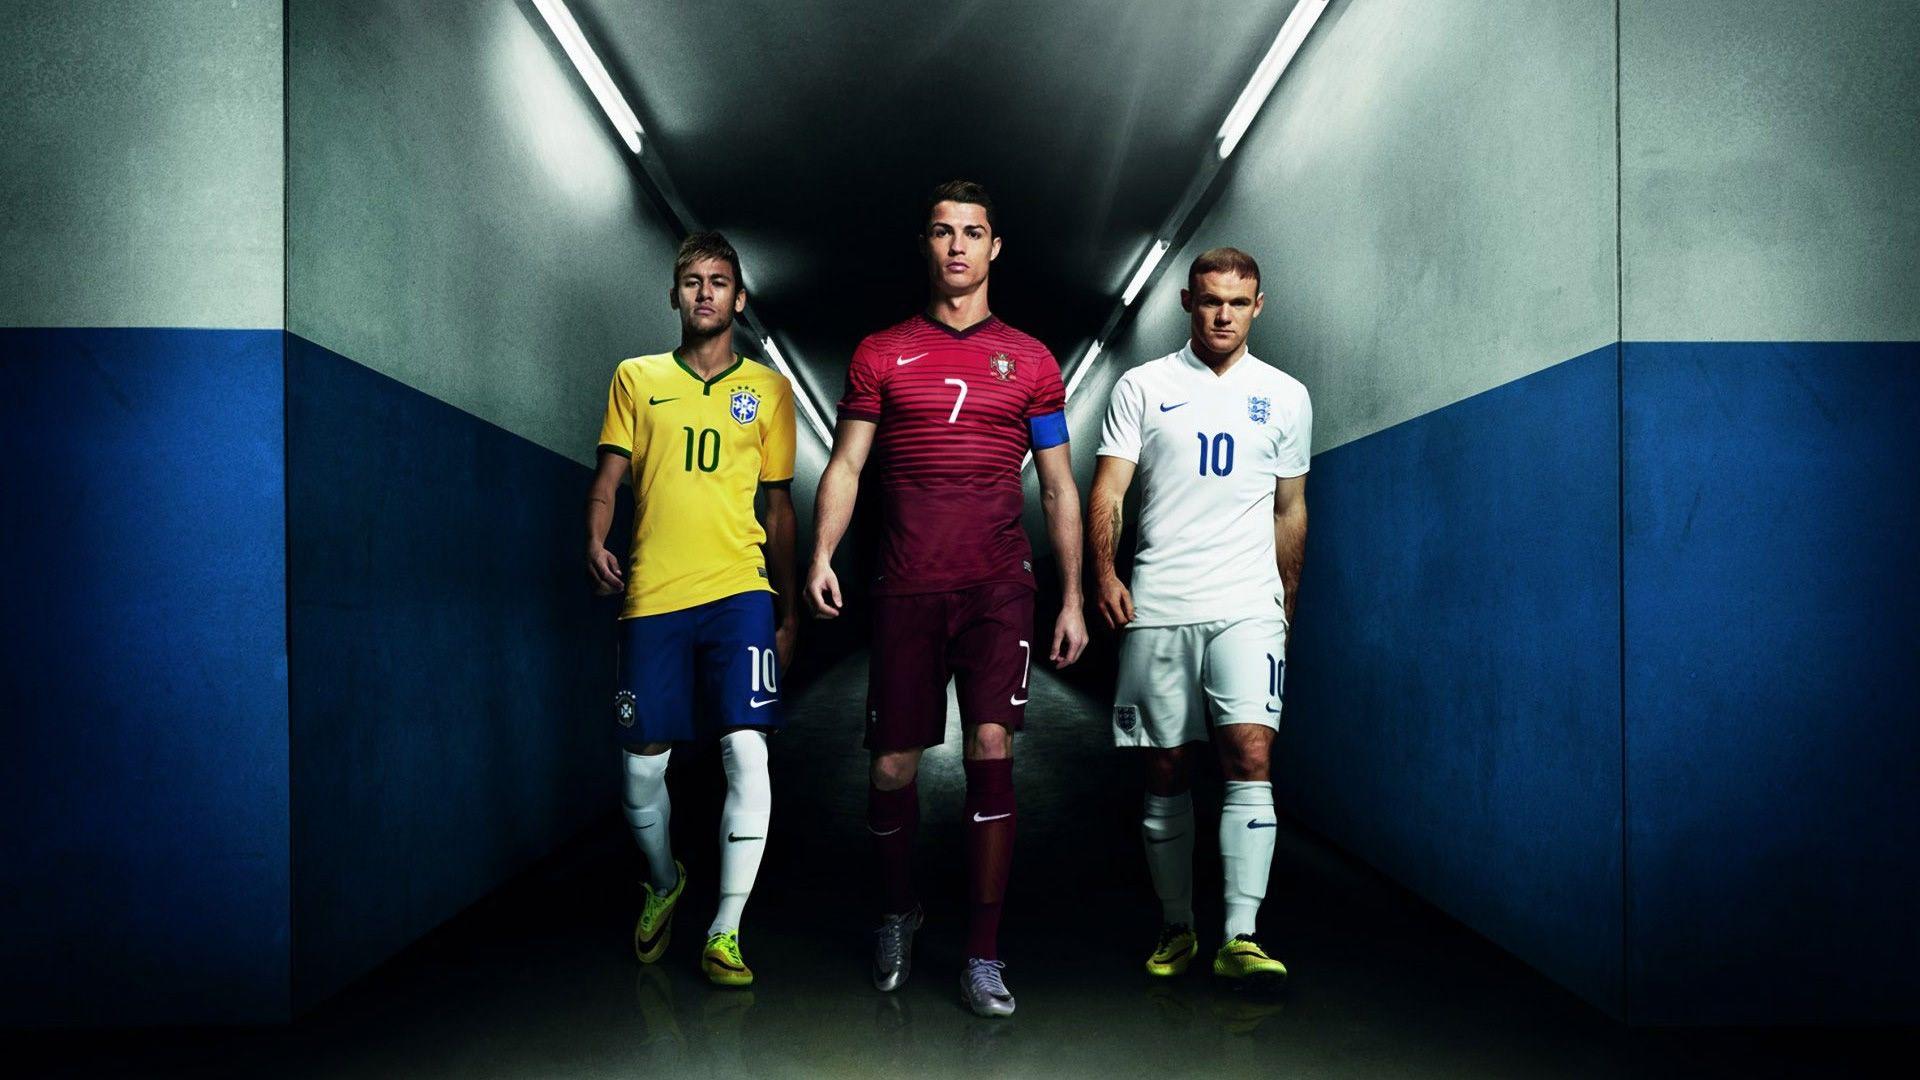 Wallpaper featuring Neymar da Silva Santos Junior, Cristiano Ronaldo and  Wayne Rooney. Neymar, Ronaldo, and Rooney – Nike wallpaper written by  Cristiano ...